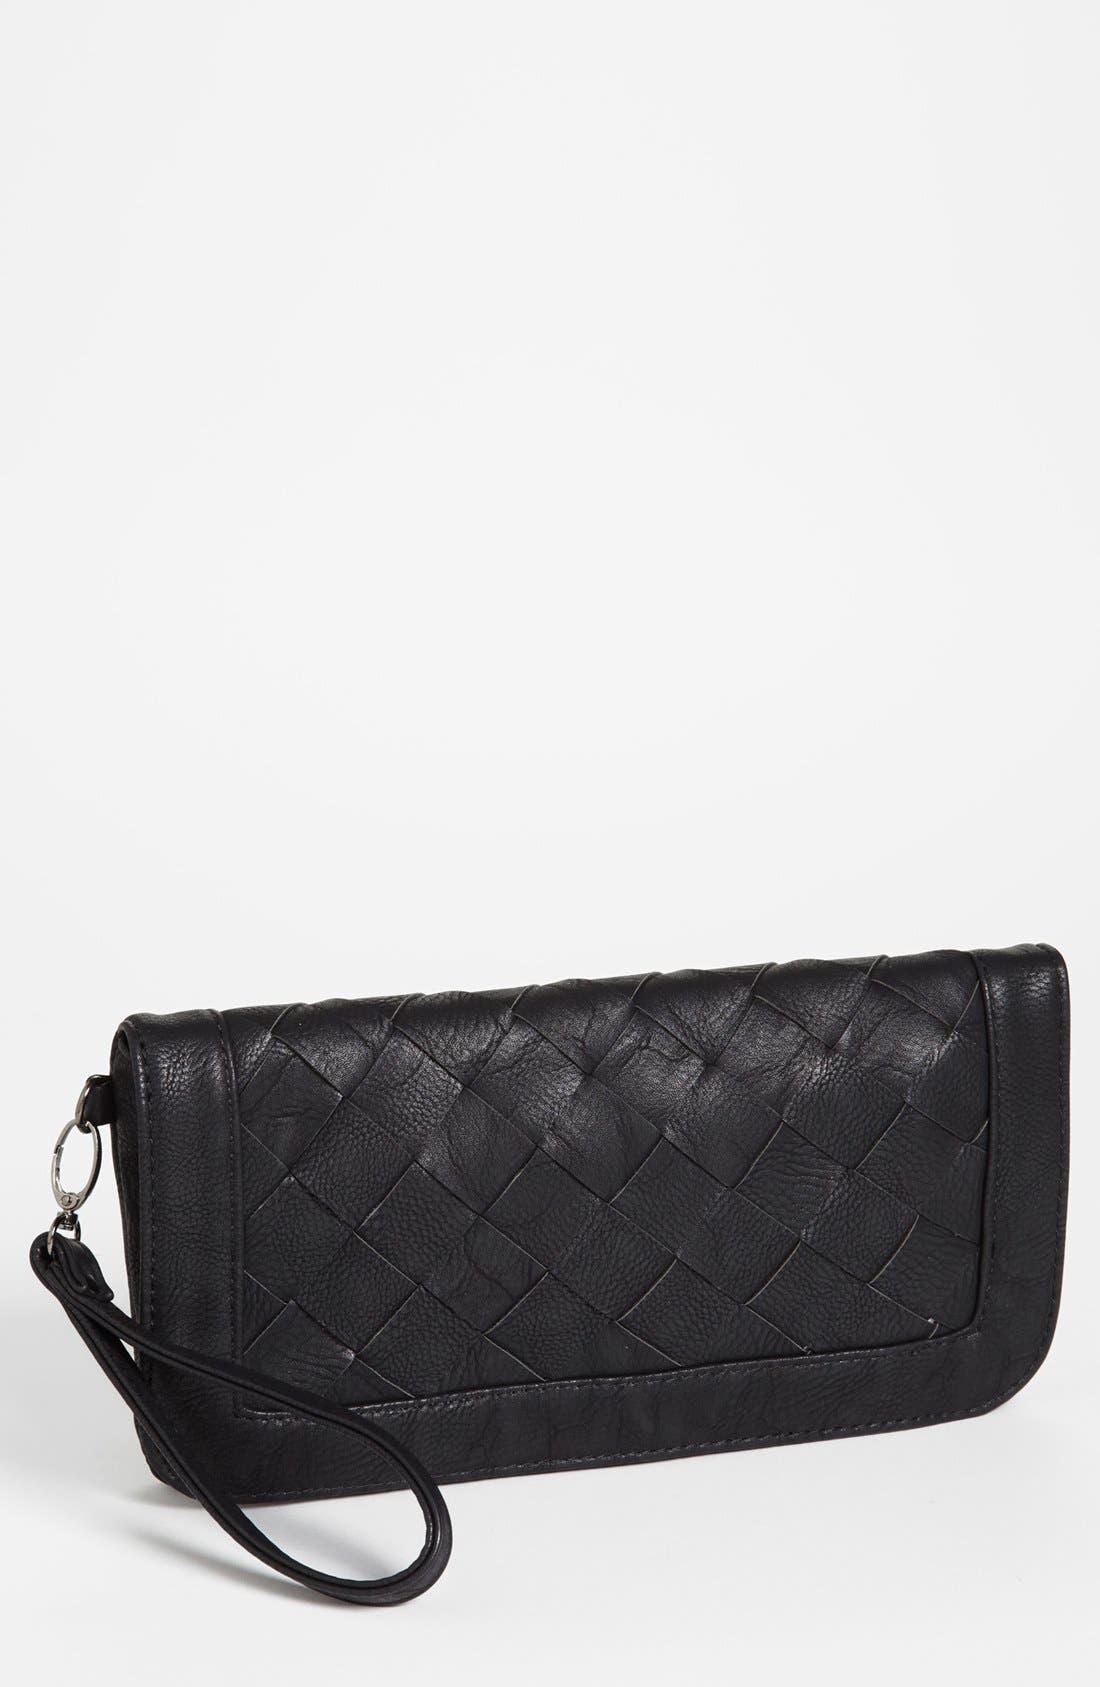 Main Image - Natasha Couture Woven Faux Leather Clutch